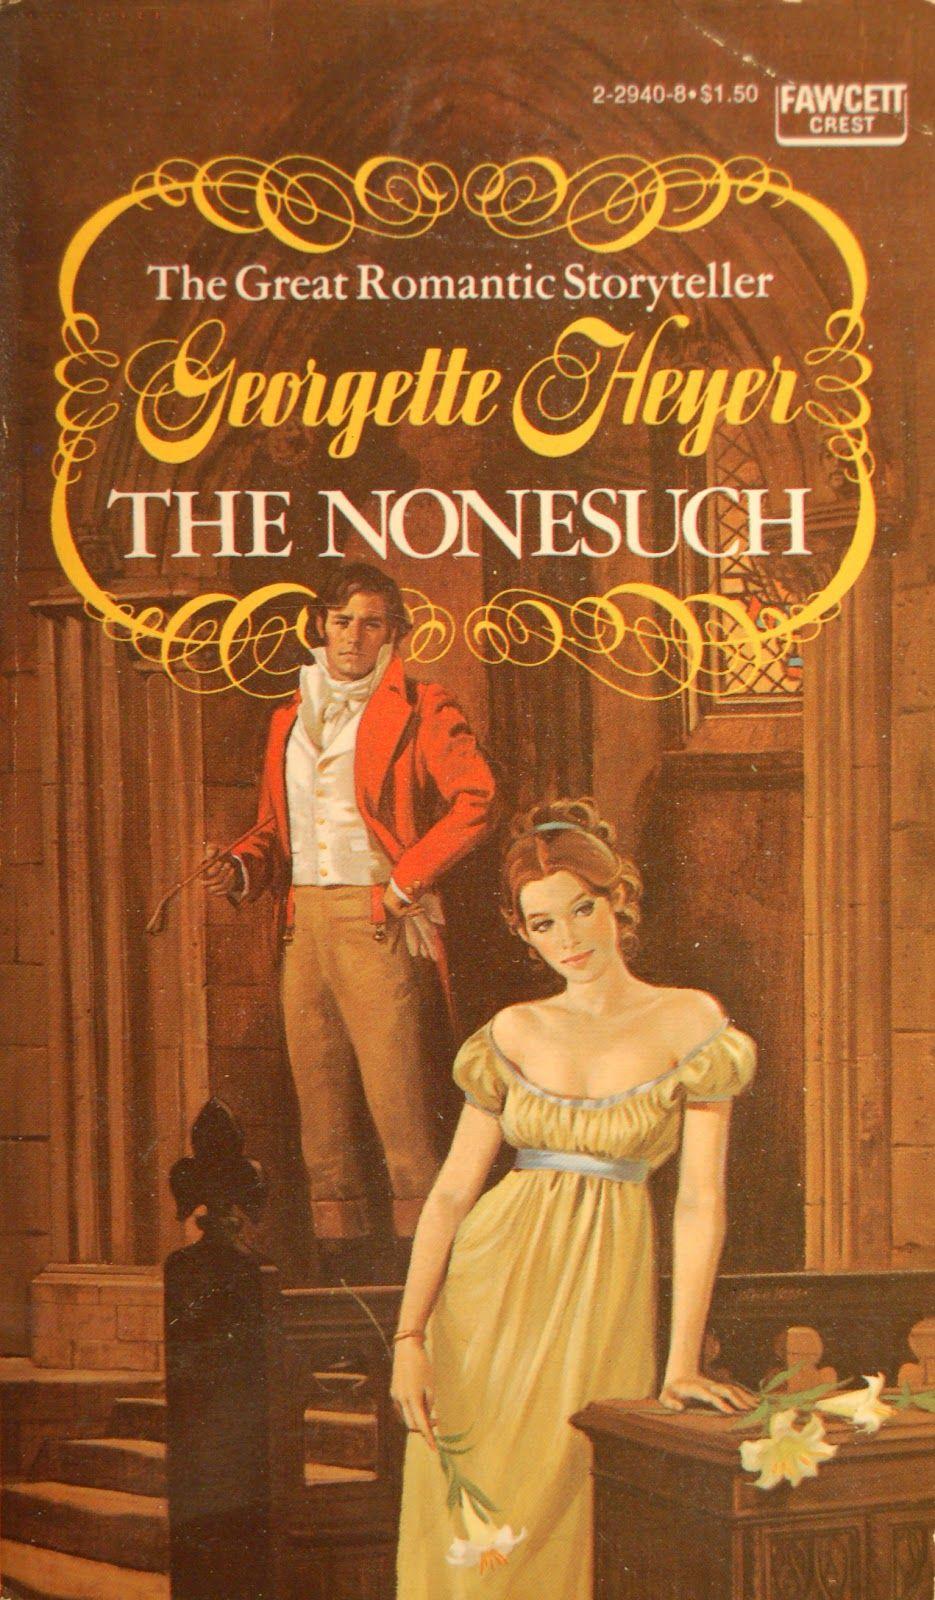 Allan Kass Book Covers Georgette Heyer The Nonesuch Historical Romance Book Covers Romance Book Covers Art Historical Romance Books